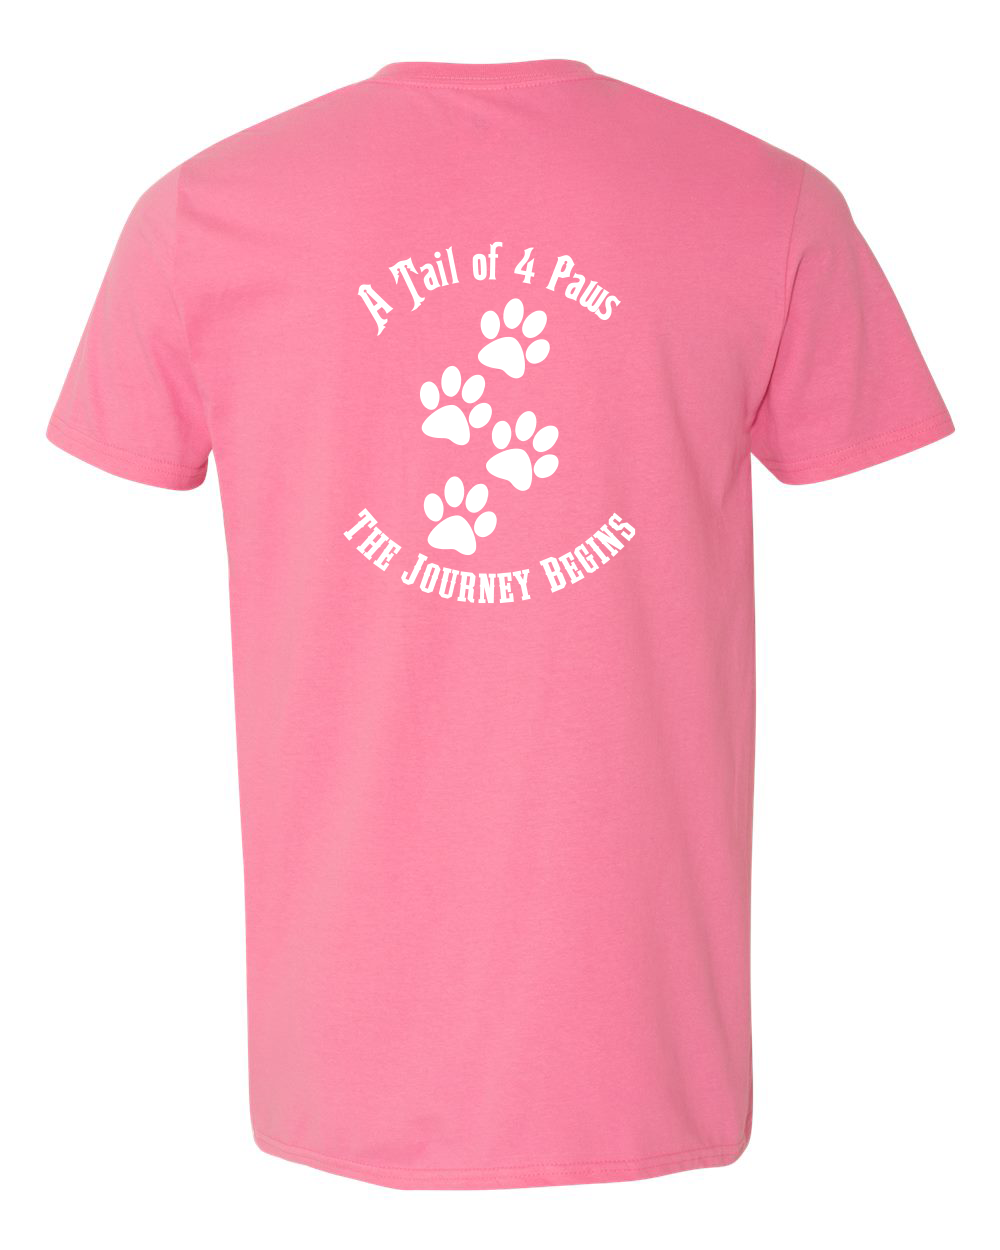 Back of Shirt Pink